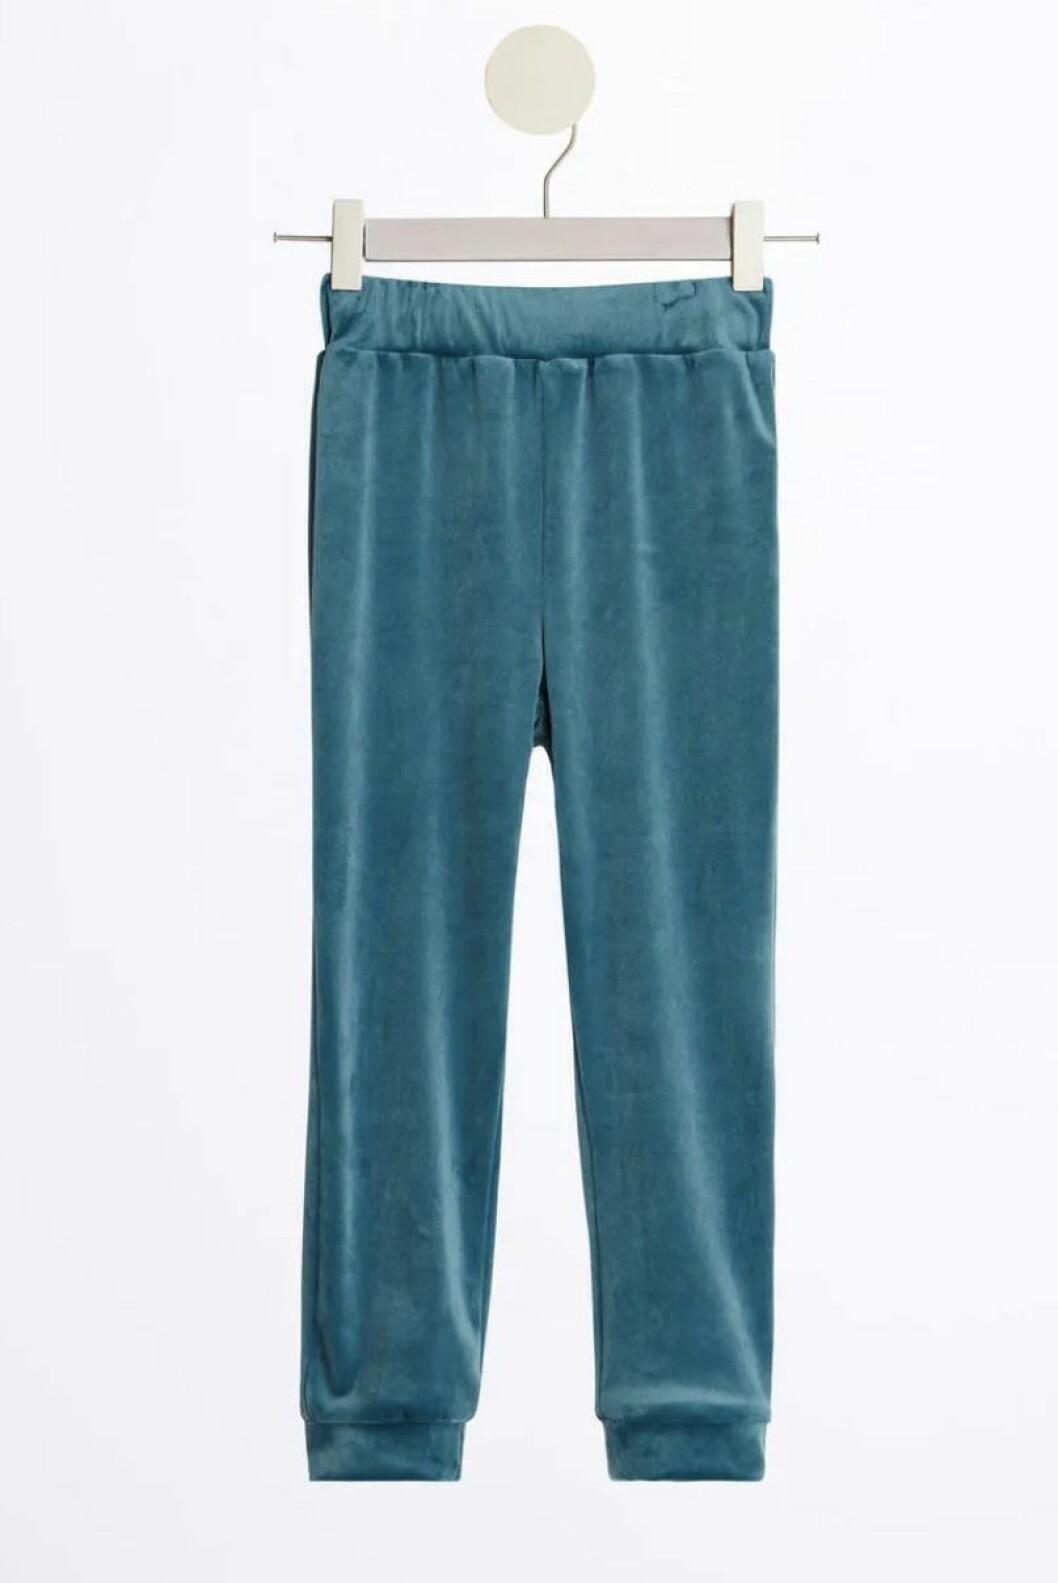 Gina tricot mini – blå sammetsbyxor